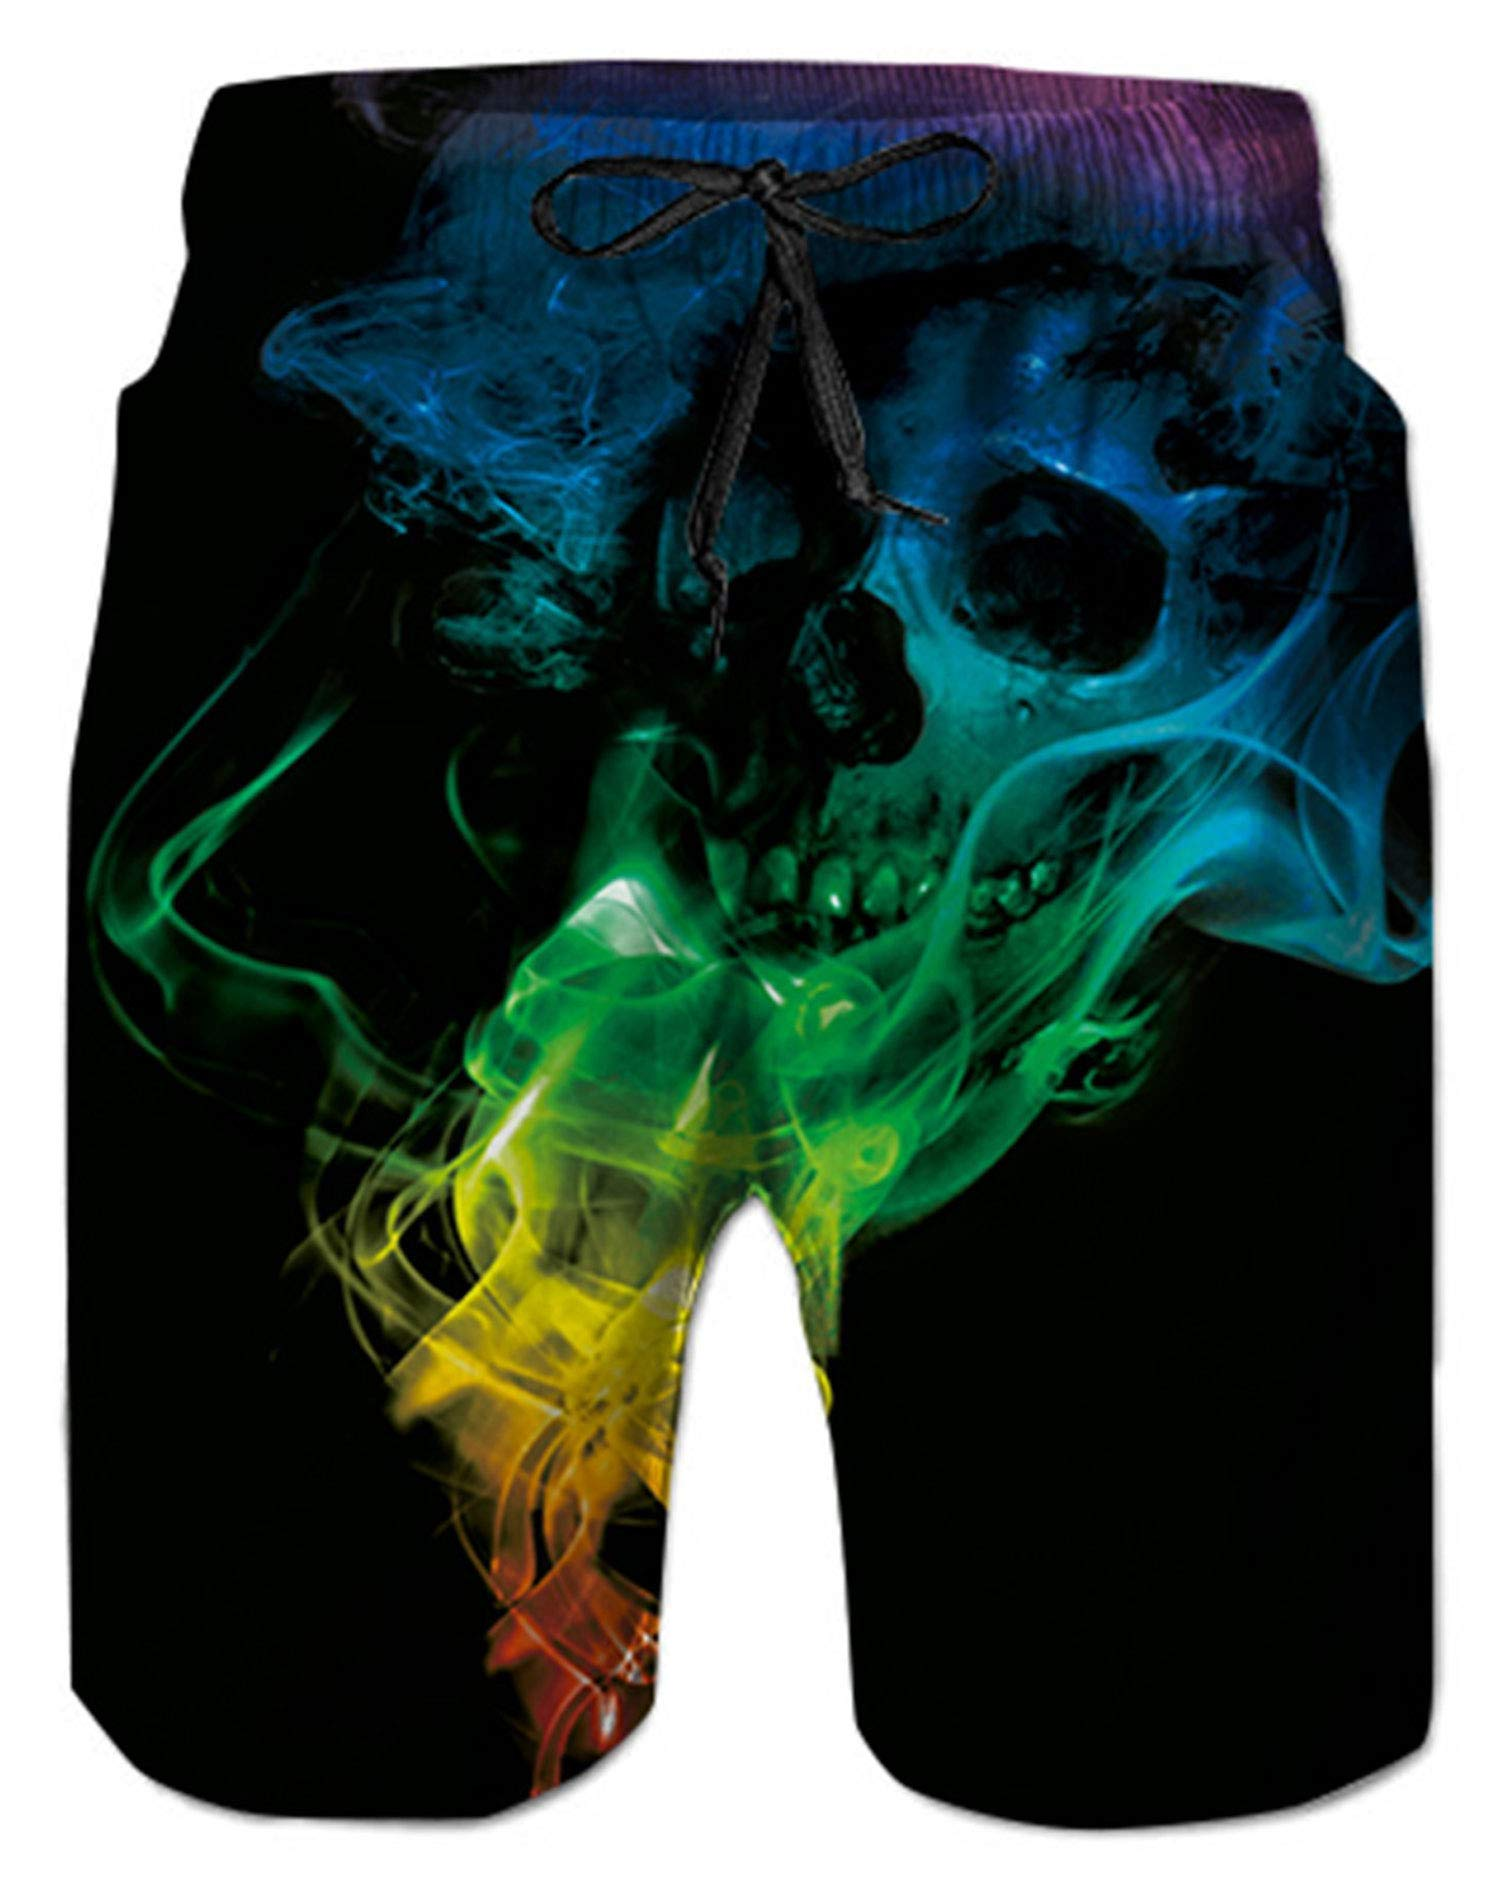 Mens Swim Trunk 3D Print Graphic Summer Beach Shorts Surfing Trunks Shorts